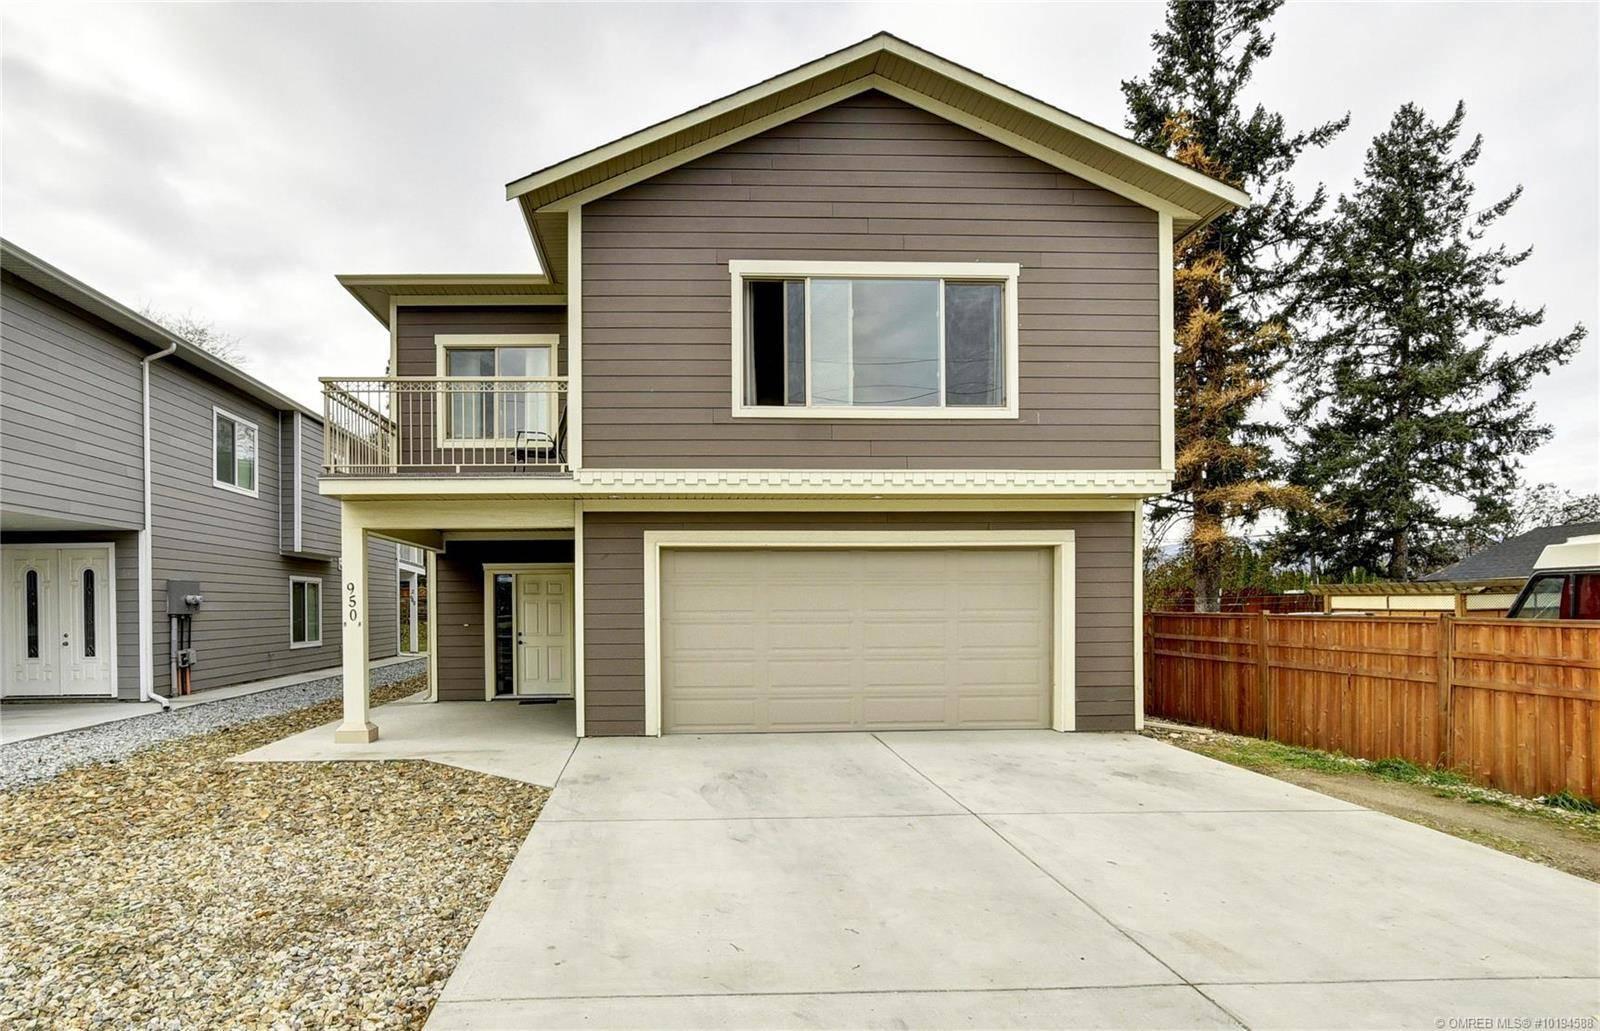 House for sale at 950 Rutland Rd North Kelowna British Columbia - MLS: 10194588